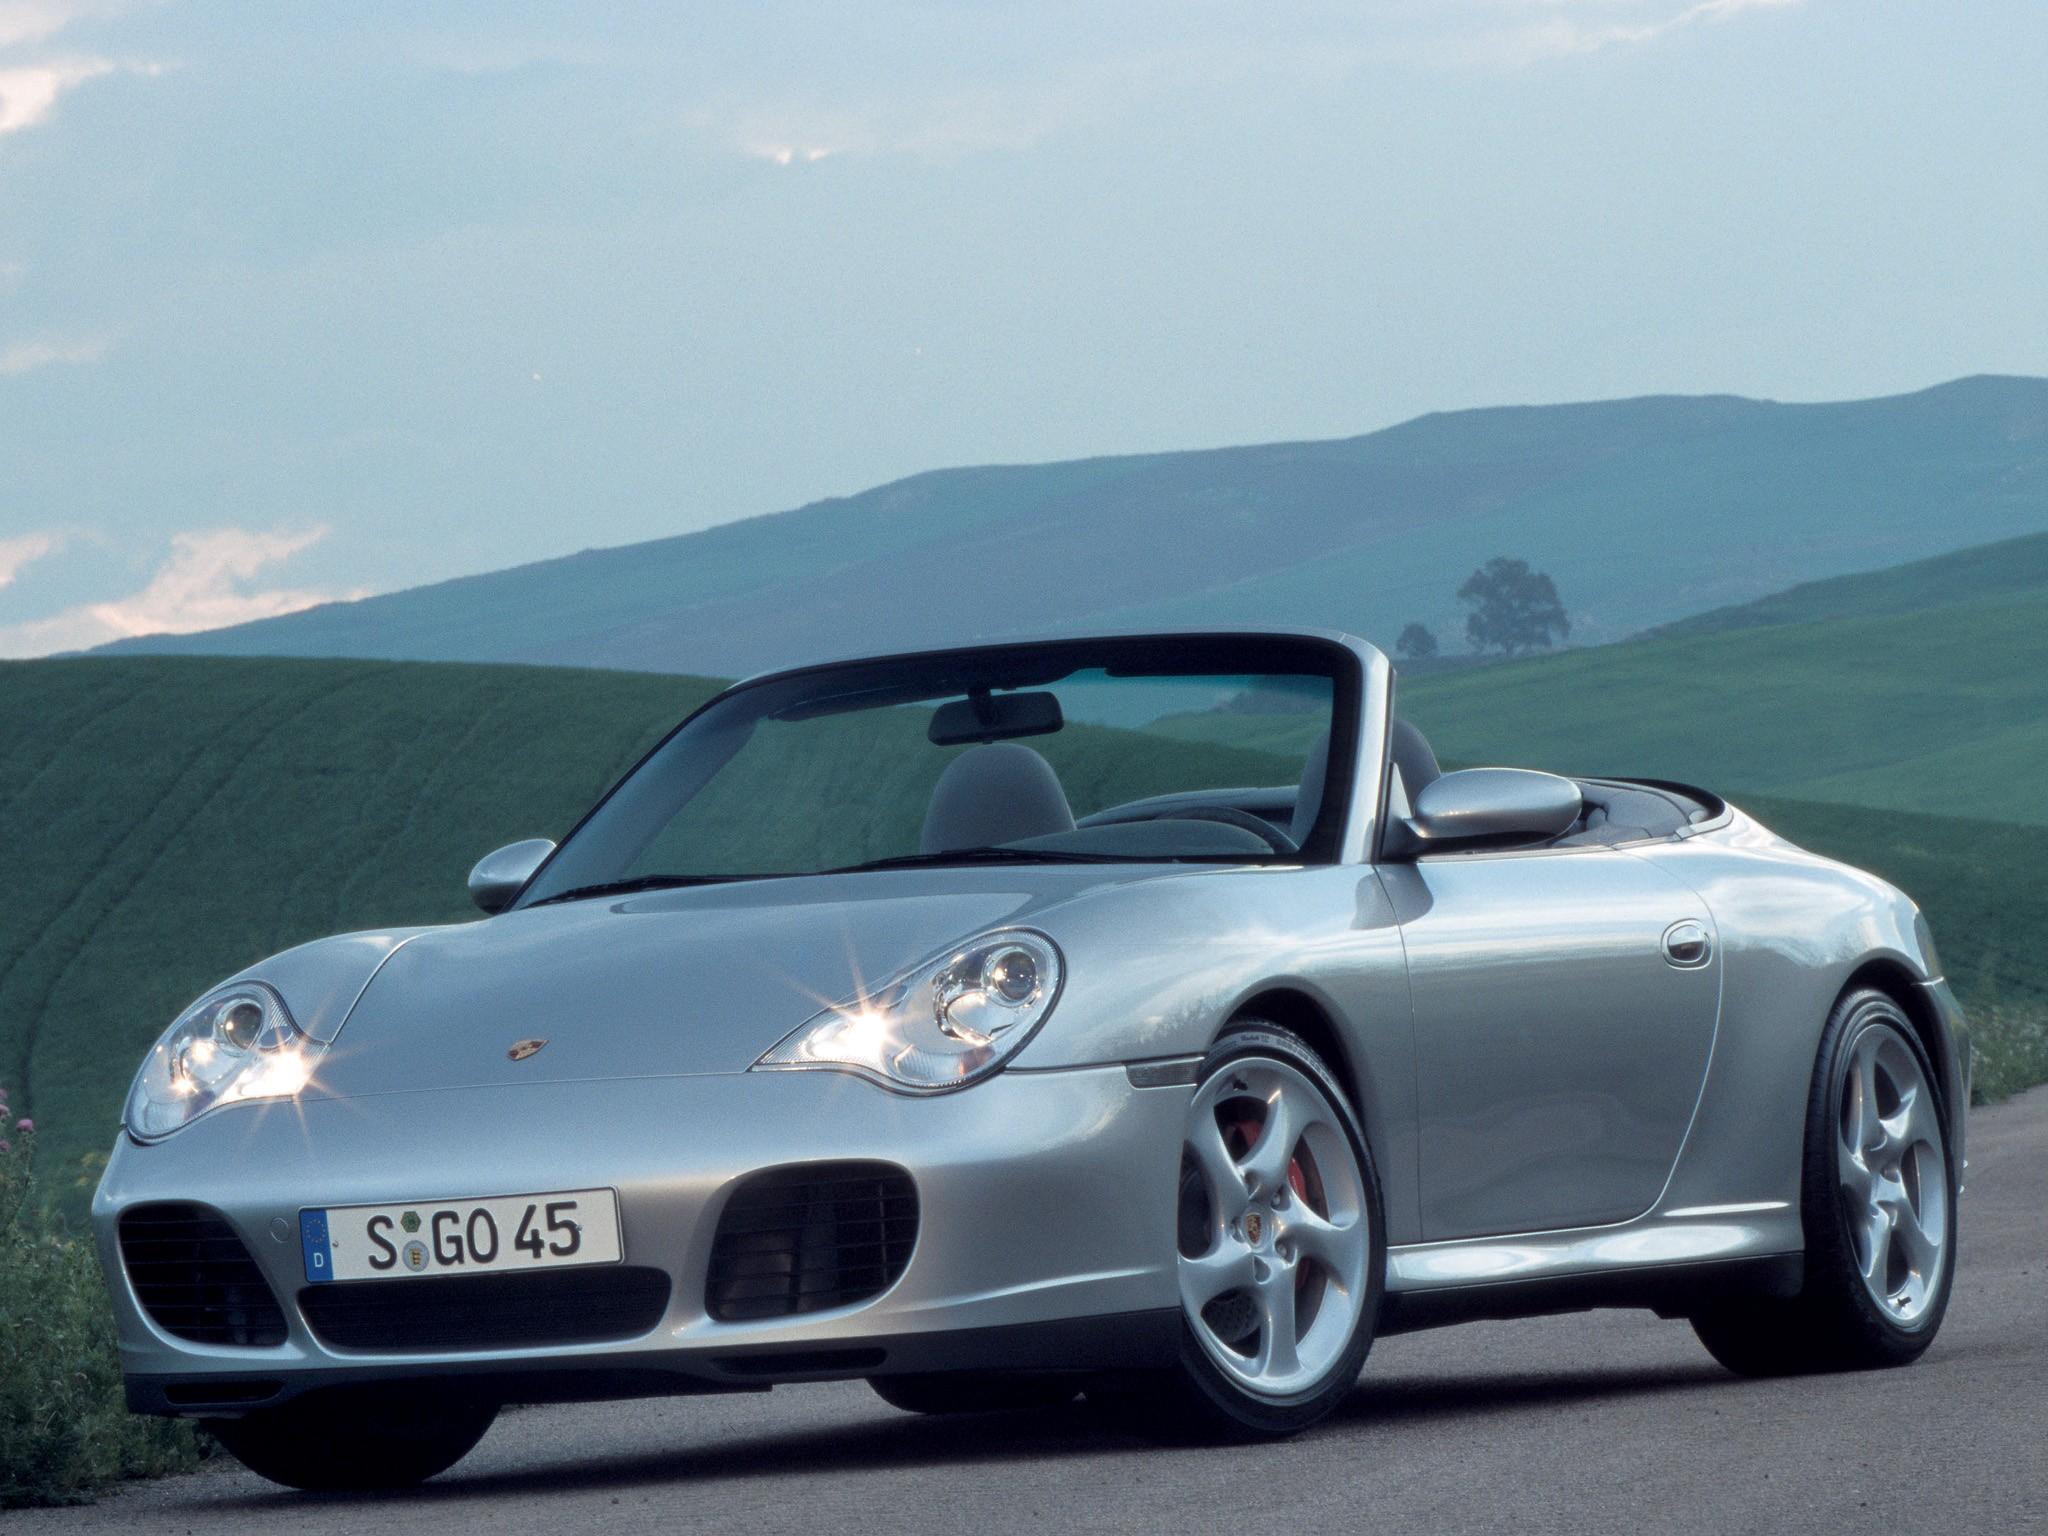 porsche 911 carrera 4s cabriolet 996 specs 2003 2004 2005 autoevolution. Black Bedroom Furniture Sets. Home Design Ideas